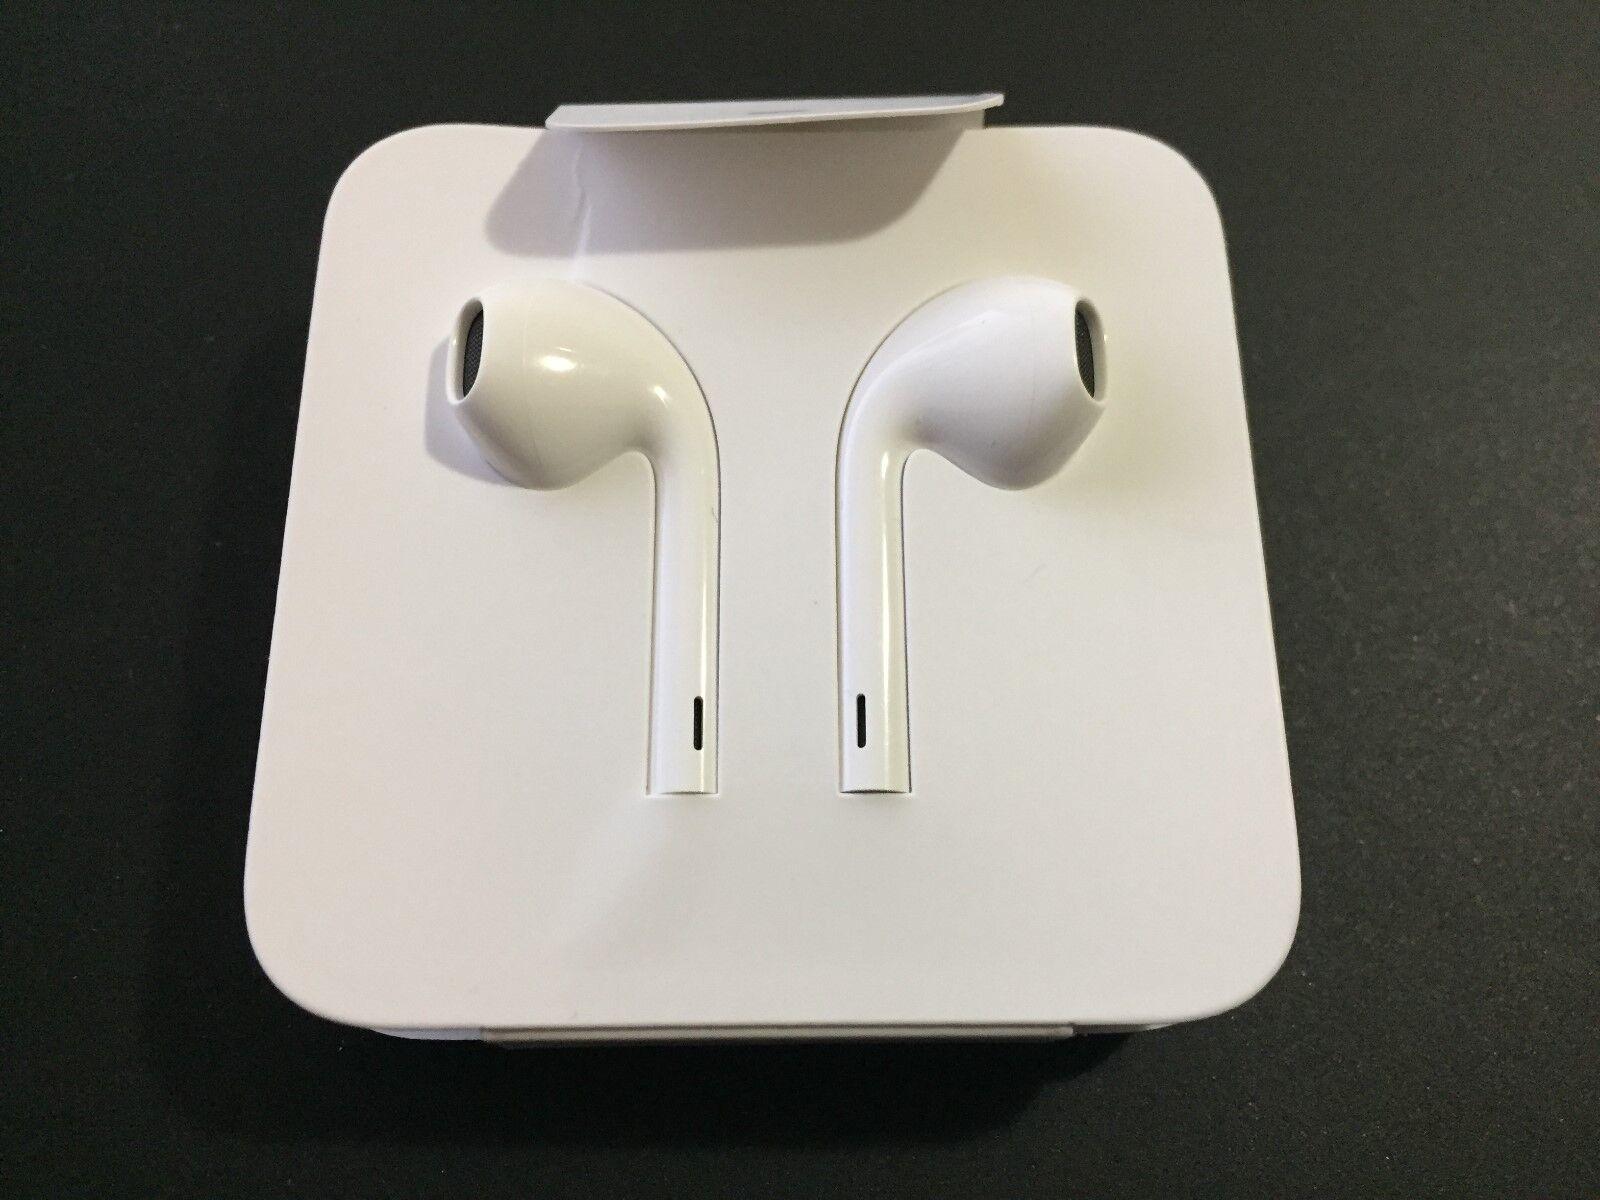 708199c3952 Details about Original OEM Apple iPhone 7 Plus iPhone 8 iPhone X Earbuds  Headphones Lightning